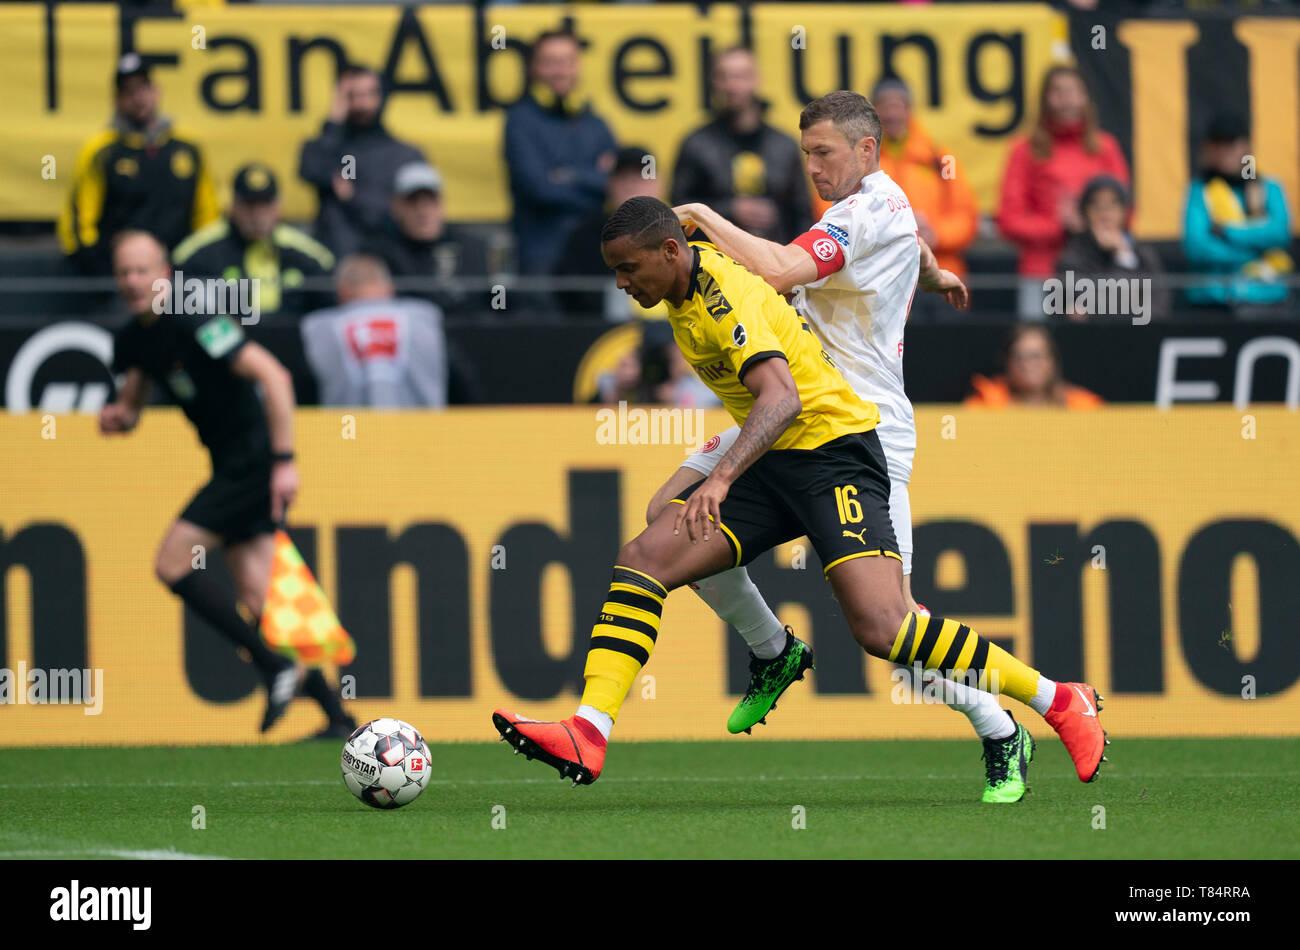 Manuel Obafemi Akanji Borussia Dortmund Fotos e Imágenes de stock ...